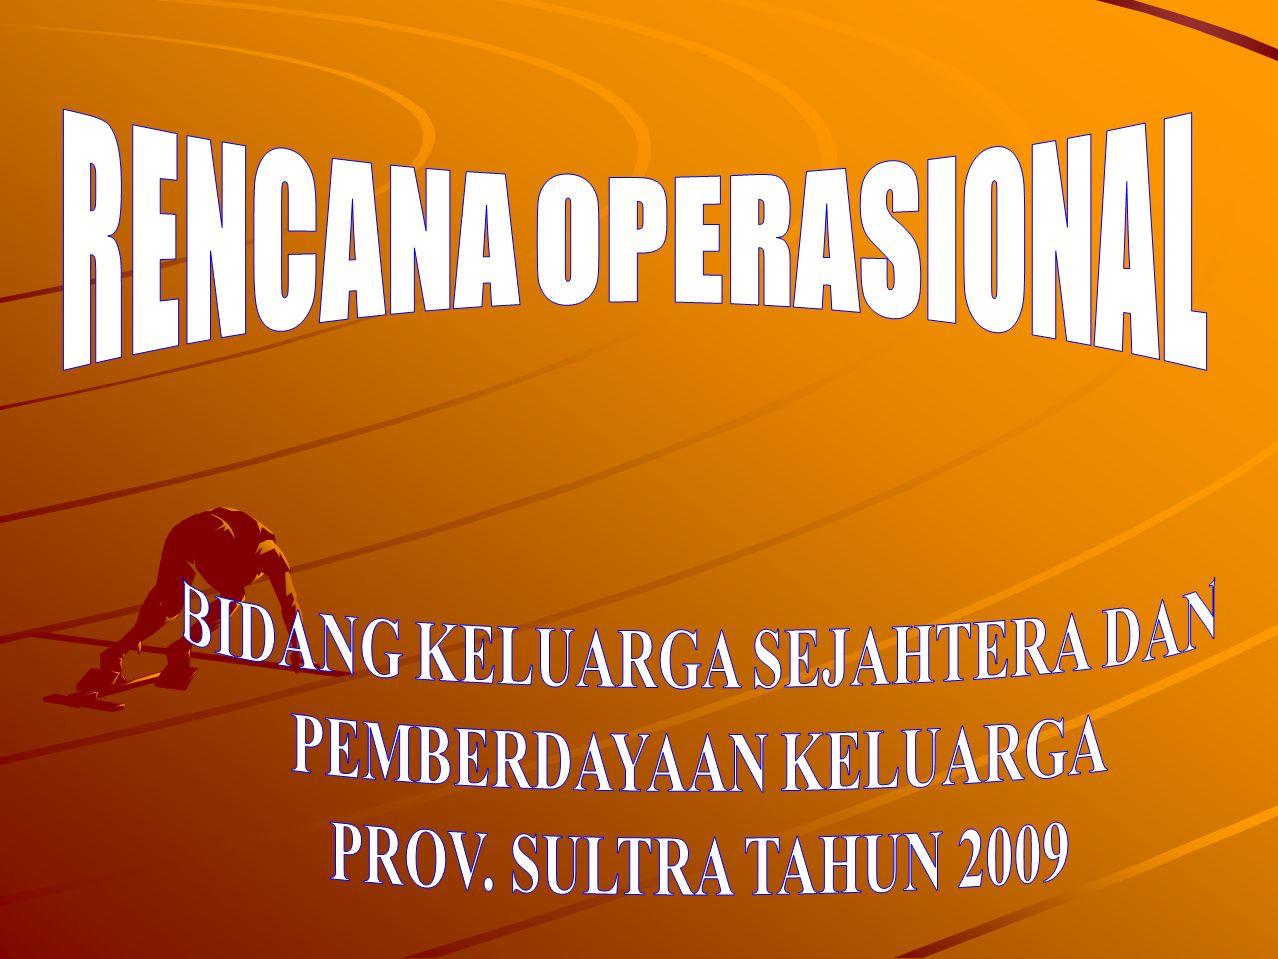 PELAYANAN KB DAN KR KKBS ADVOKASI & KIE PERANSERTA MASYARAKAT MISSION CENTER MISSION CENTER(KS-PK) (KB-KR) SERVICE CENTER VISI MISI GRAND STRATEGY PROGRAM KB KBNASIONAL VISI MISI GRAND STRATEGY RPJMN 2009